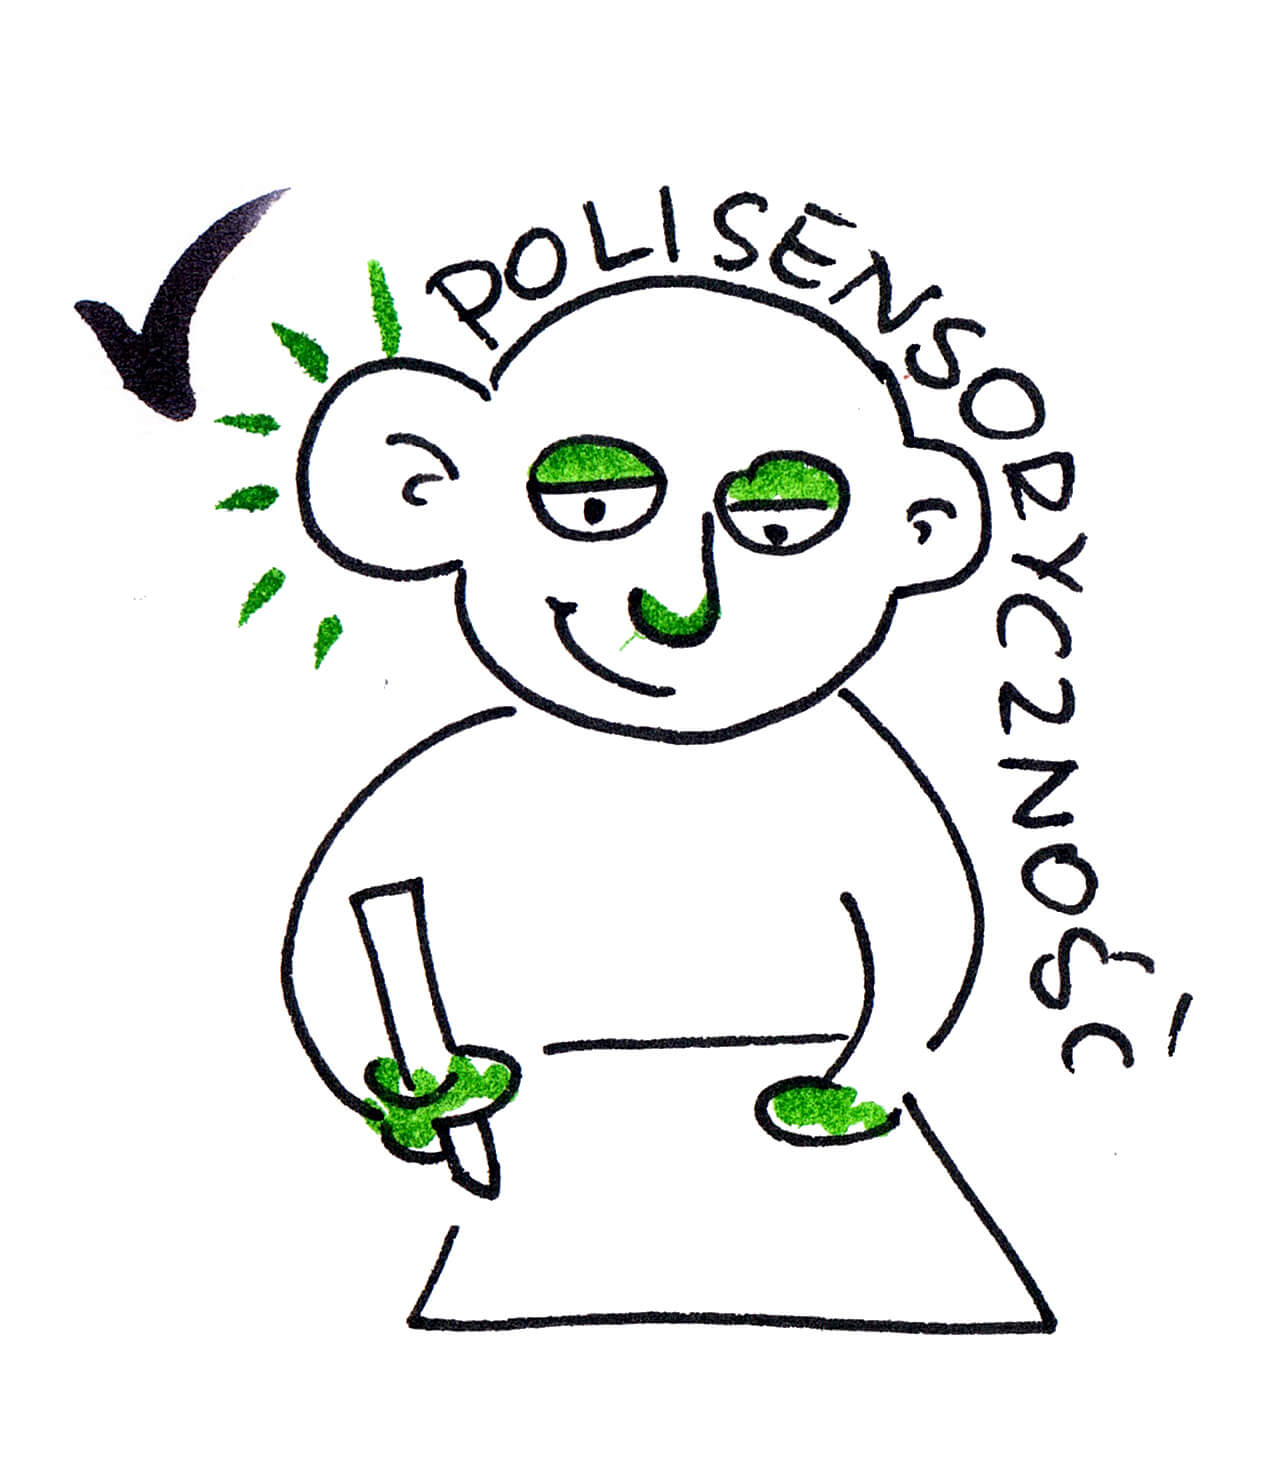 5. polisensorycznosc rysowania klaudia tolman